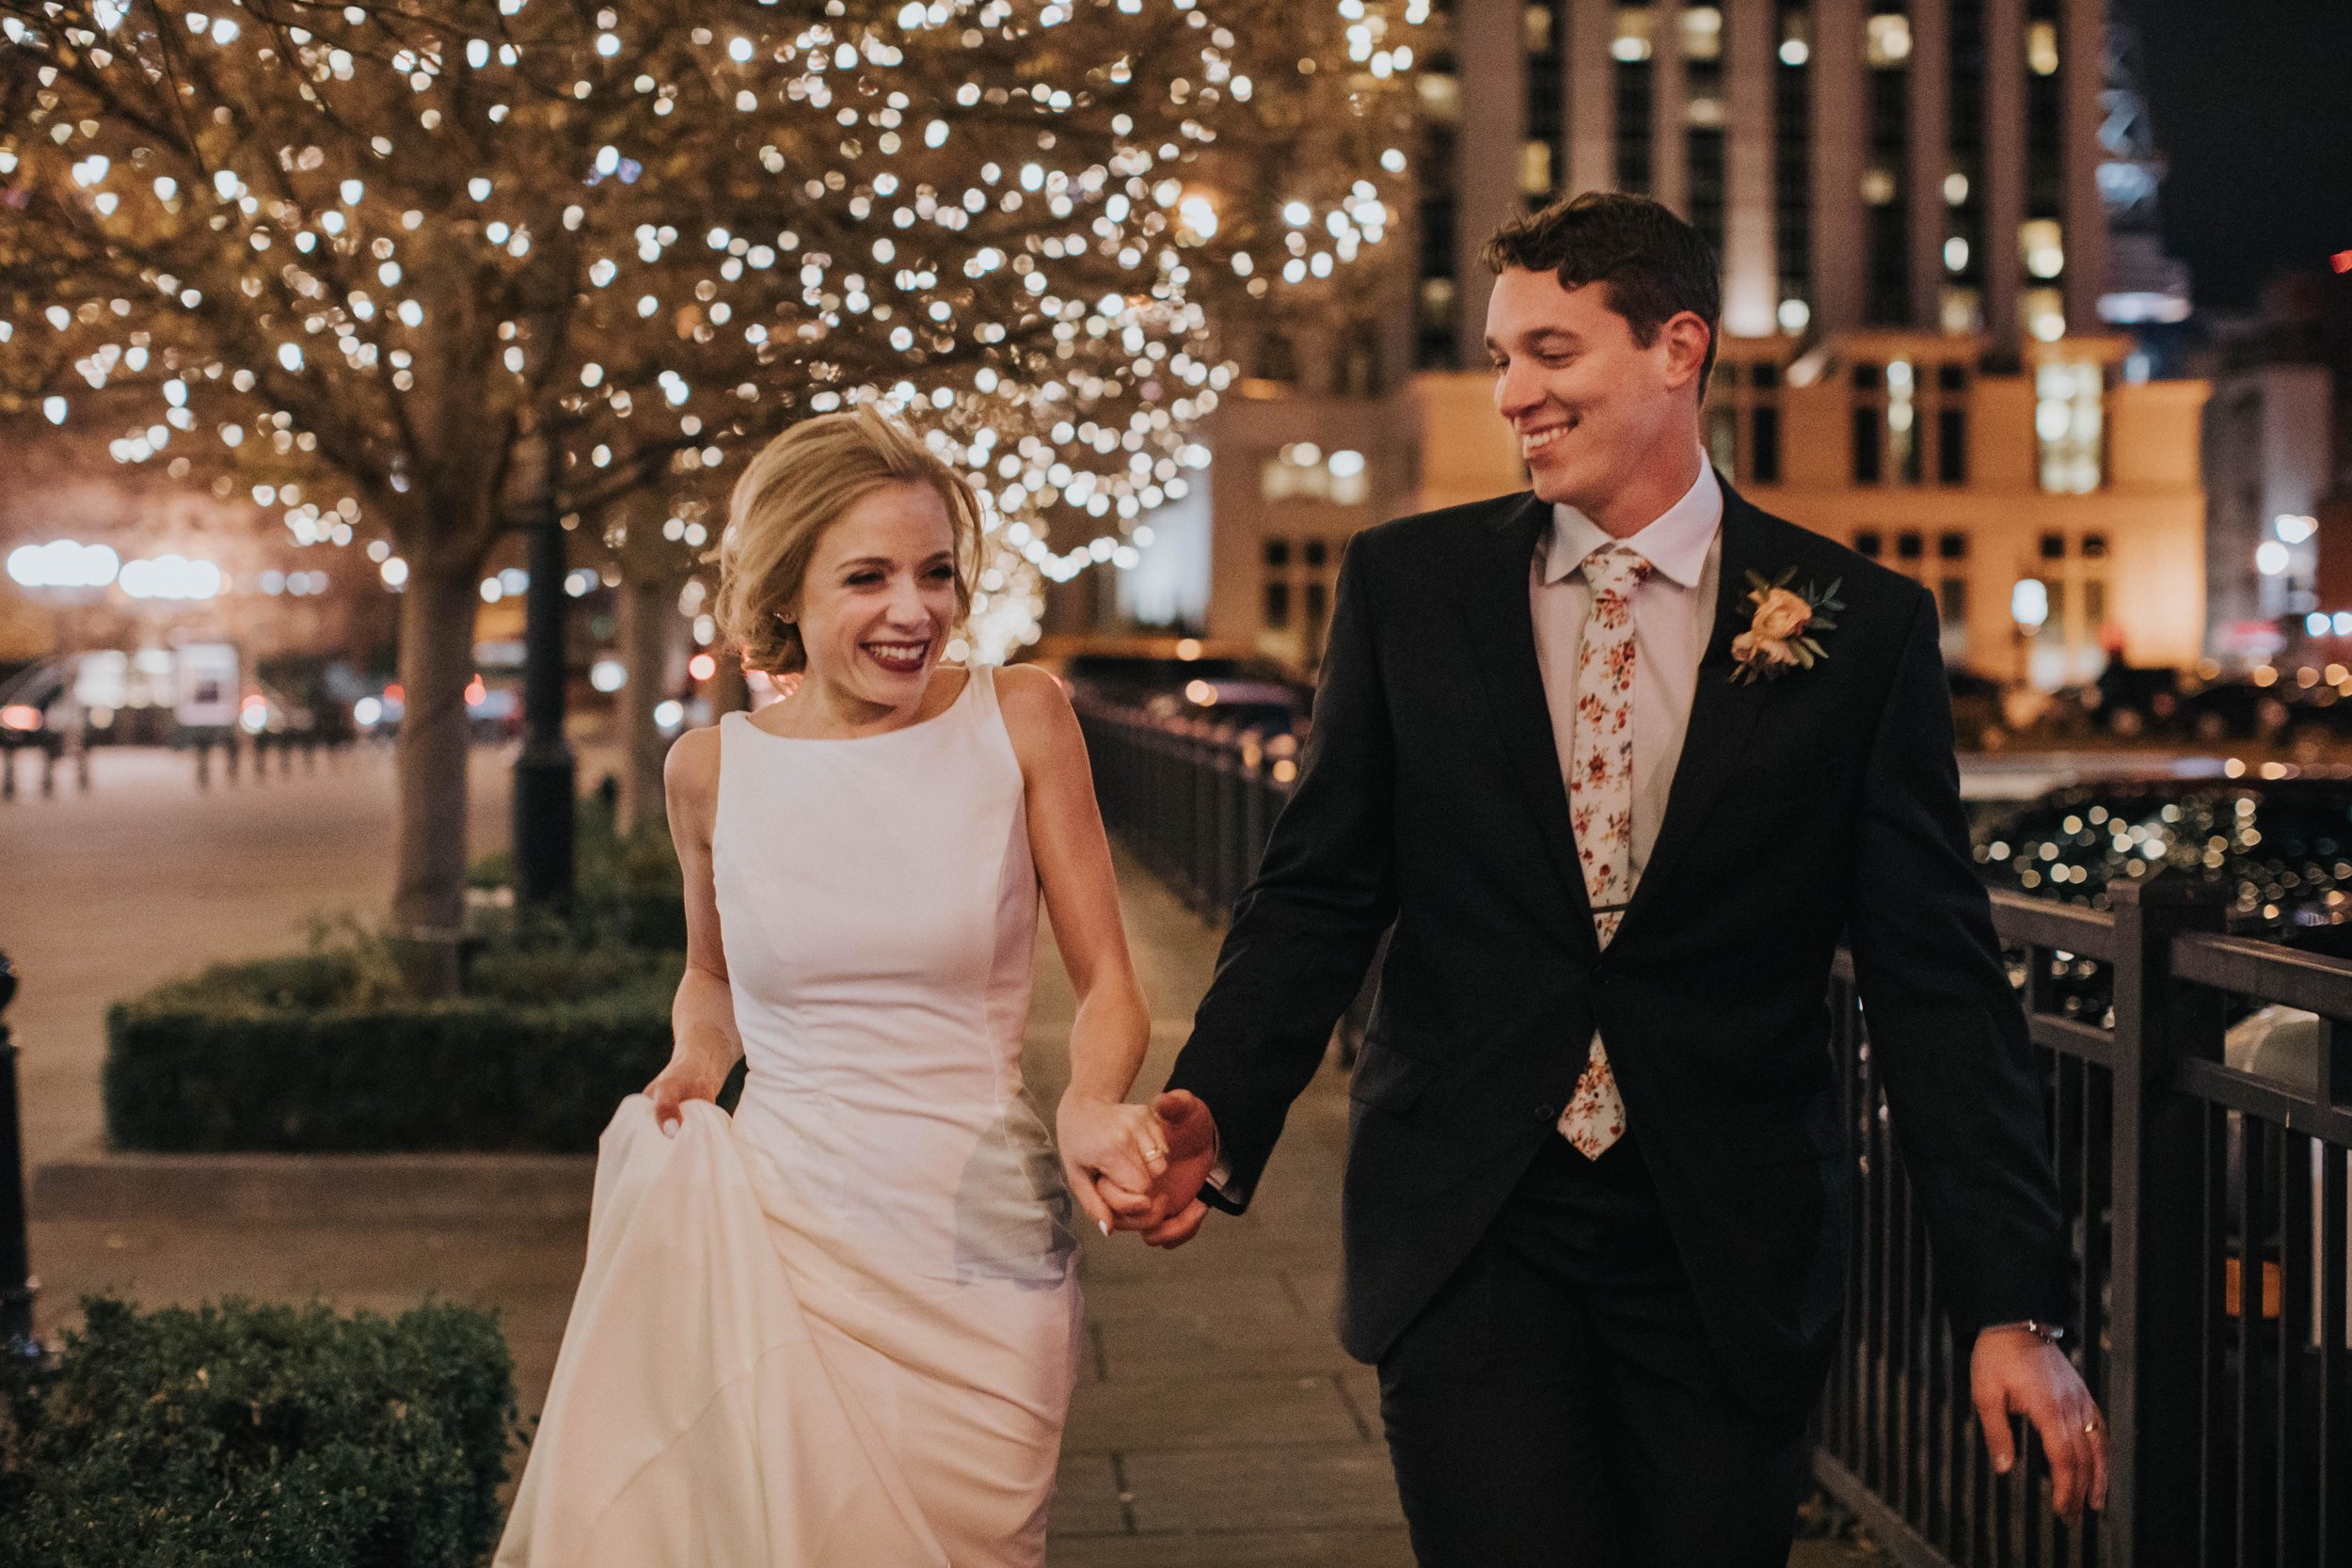 Charis_Lauren_Romantic_Wedding_Photographer_Nashville_03A0067.jpg